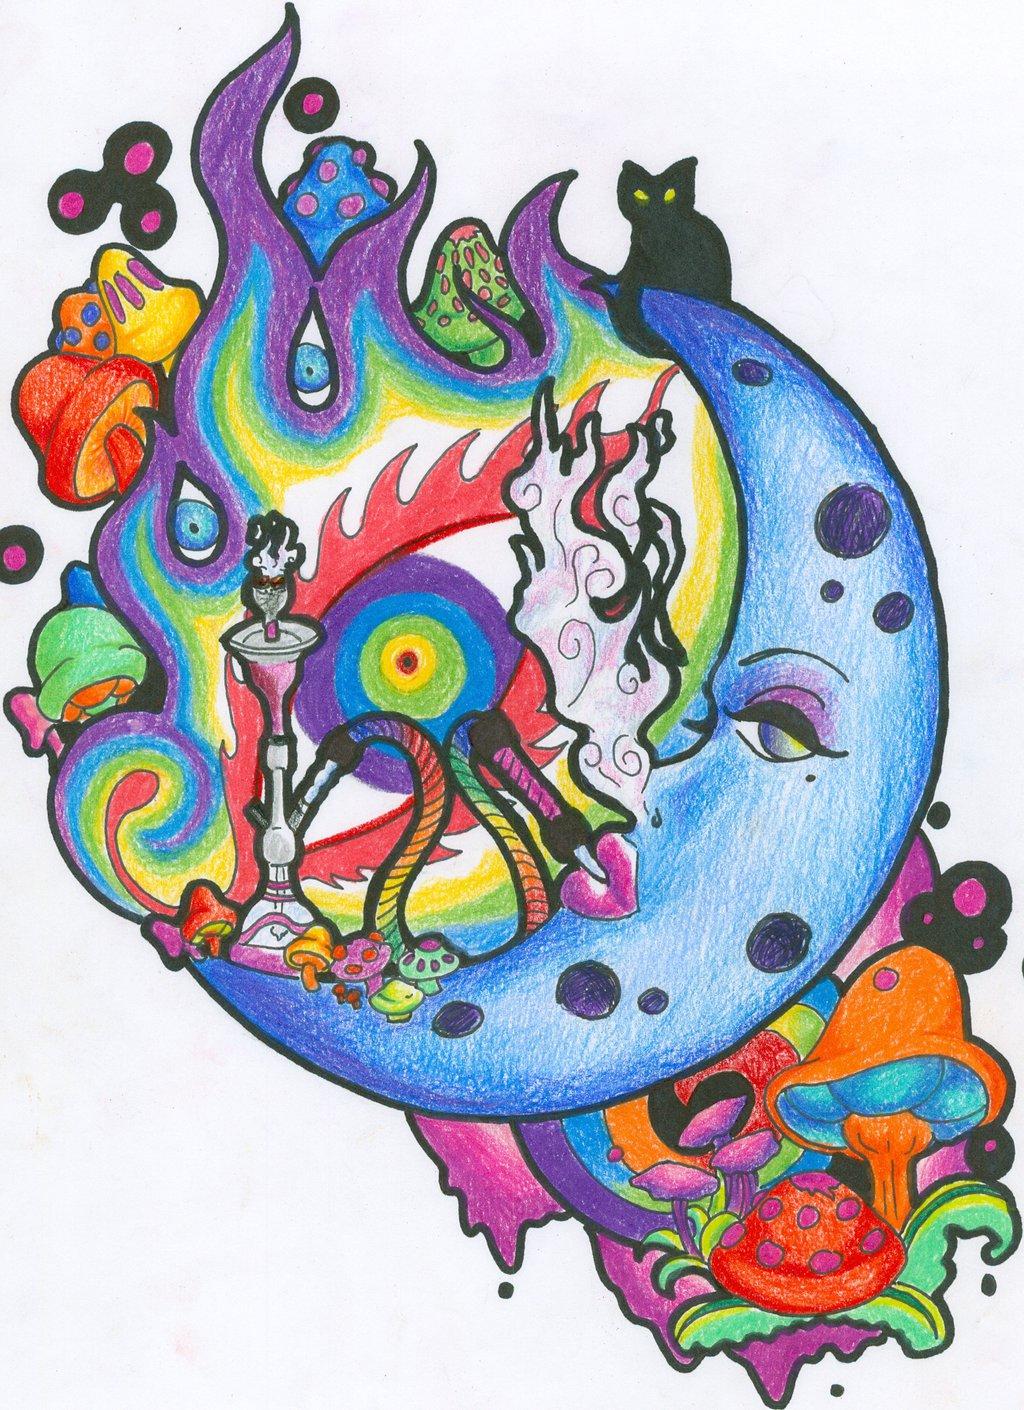 Drawn triipy third eye On  Moon Open Third